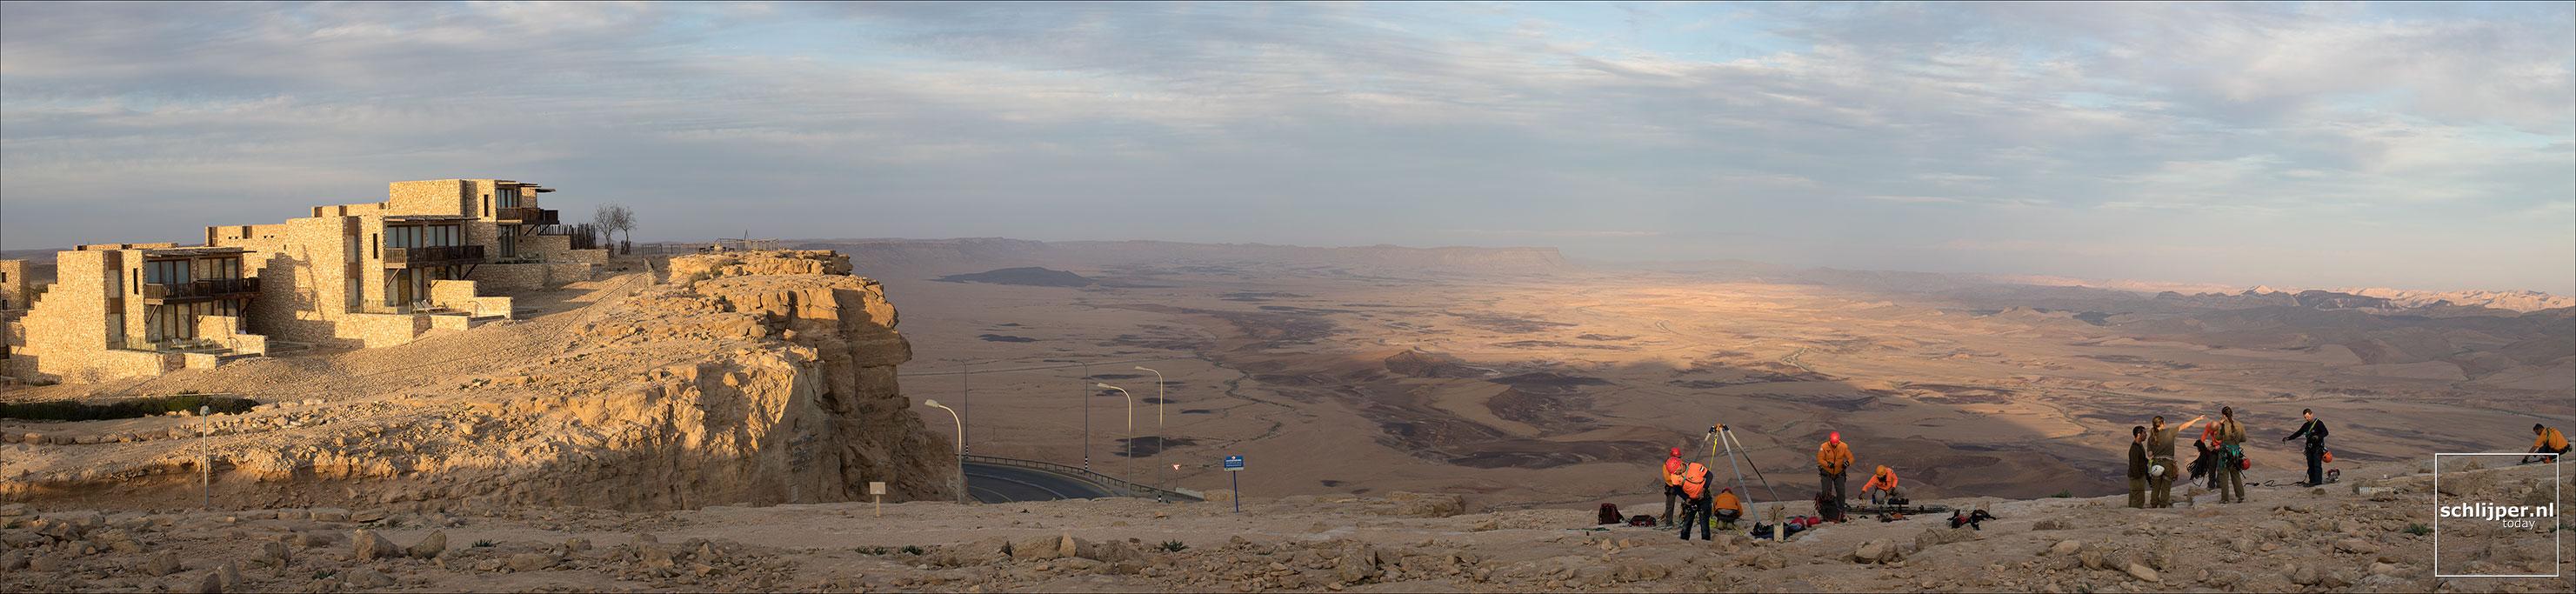 Israel, Mitspe Ramon, 12 maart 2019